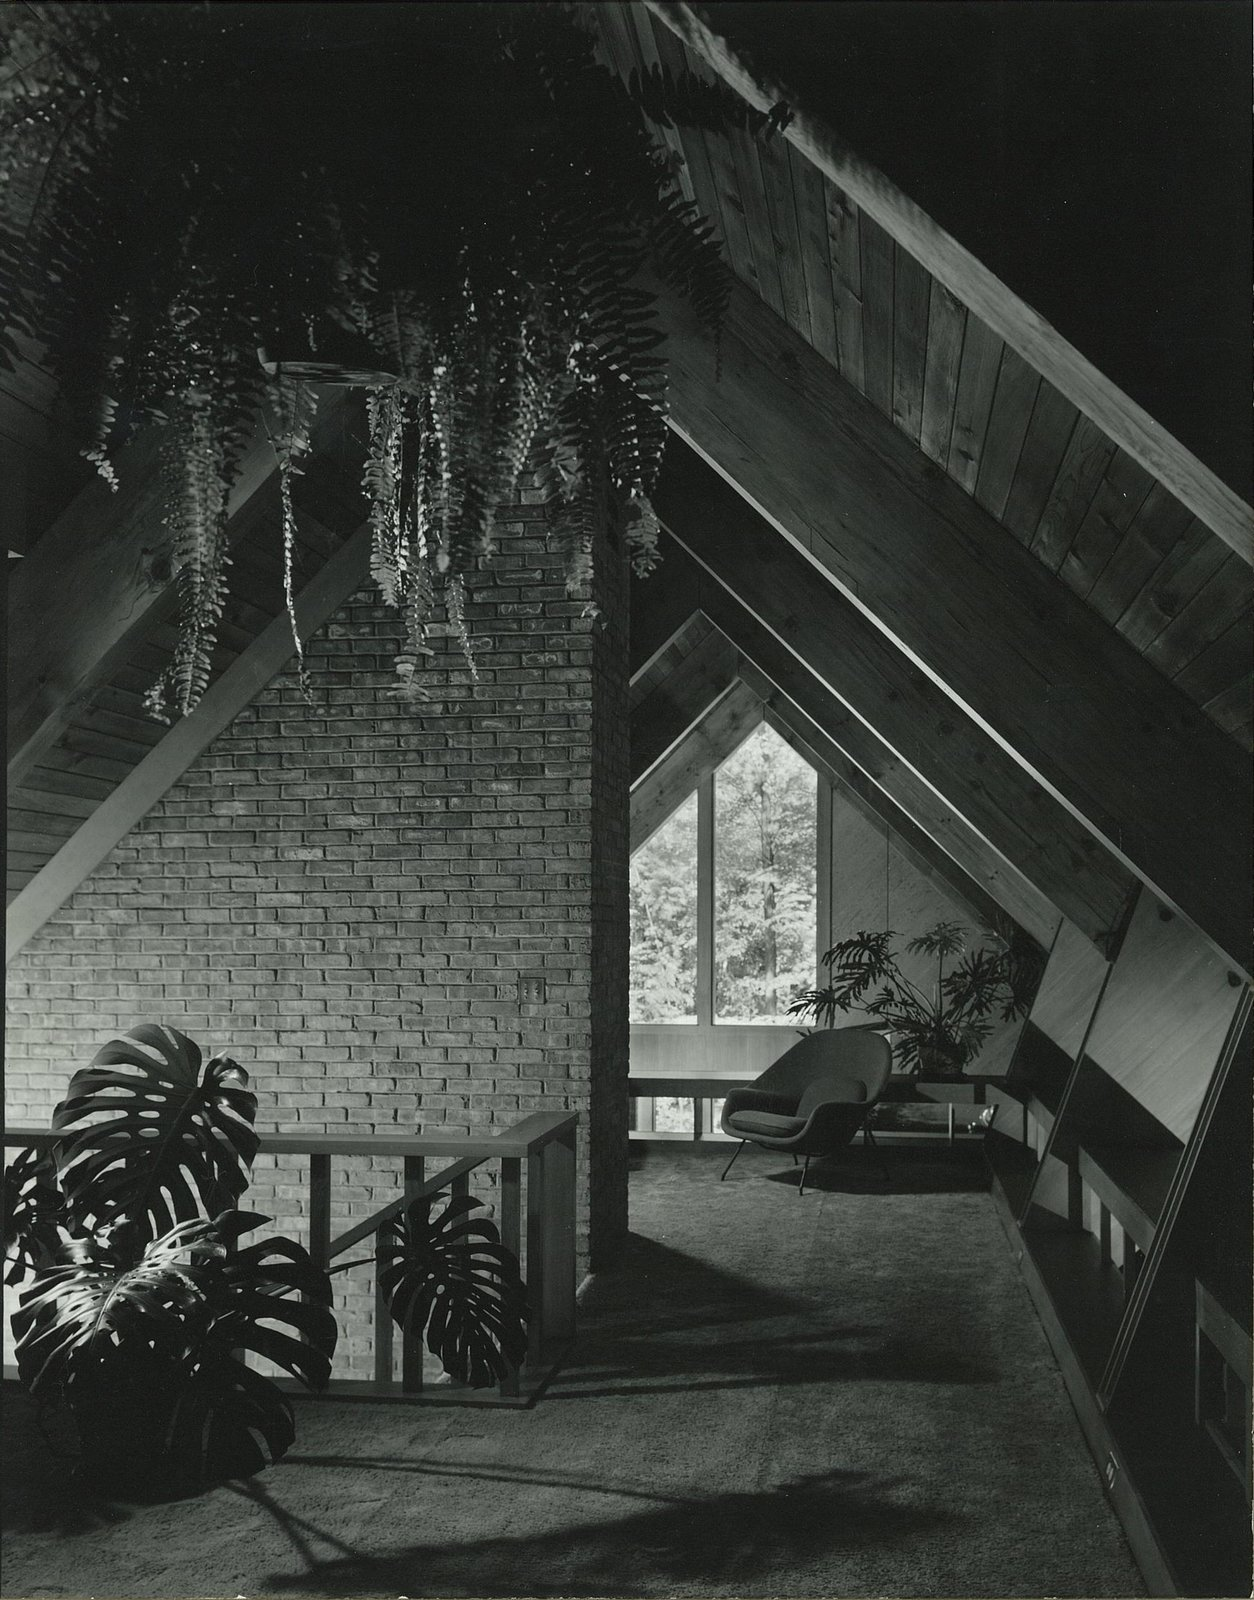 The Josephine Ashmun Residence by Alden B. Dow  The Josephine Ashmun Residence by Alden B. Dow Home and Studio -  Mid-Century Modern